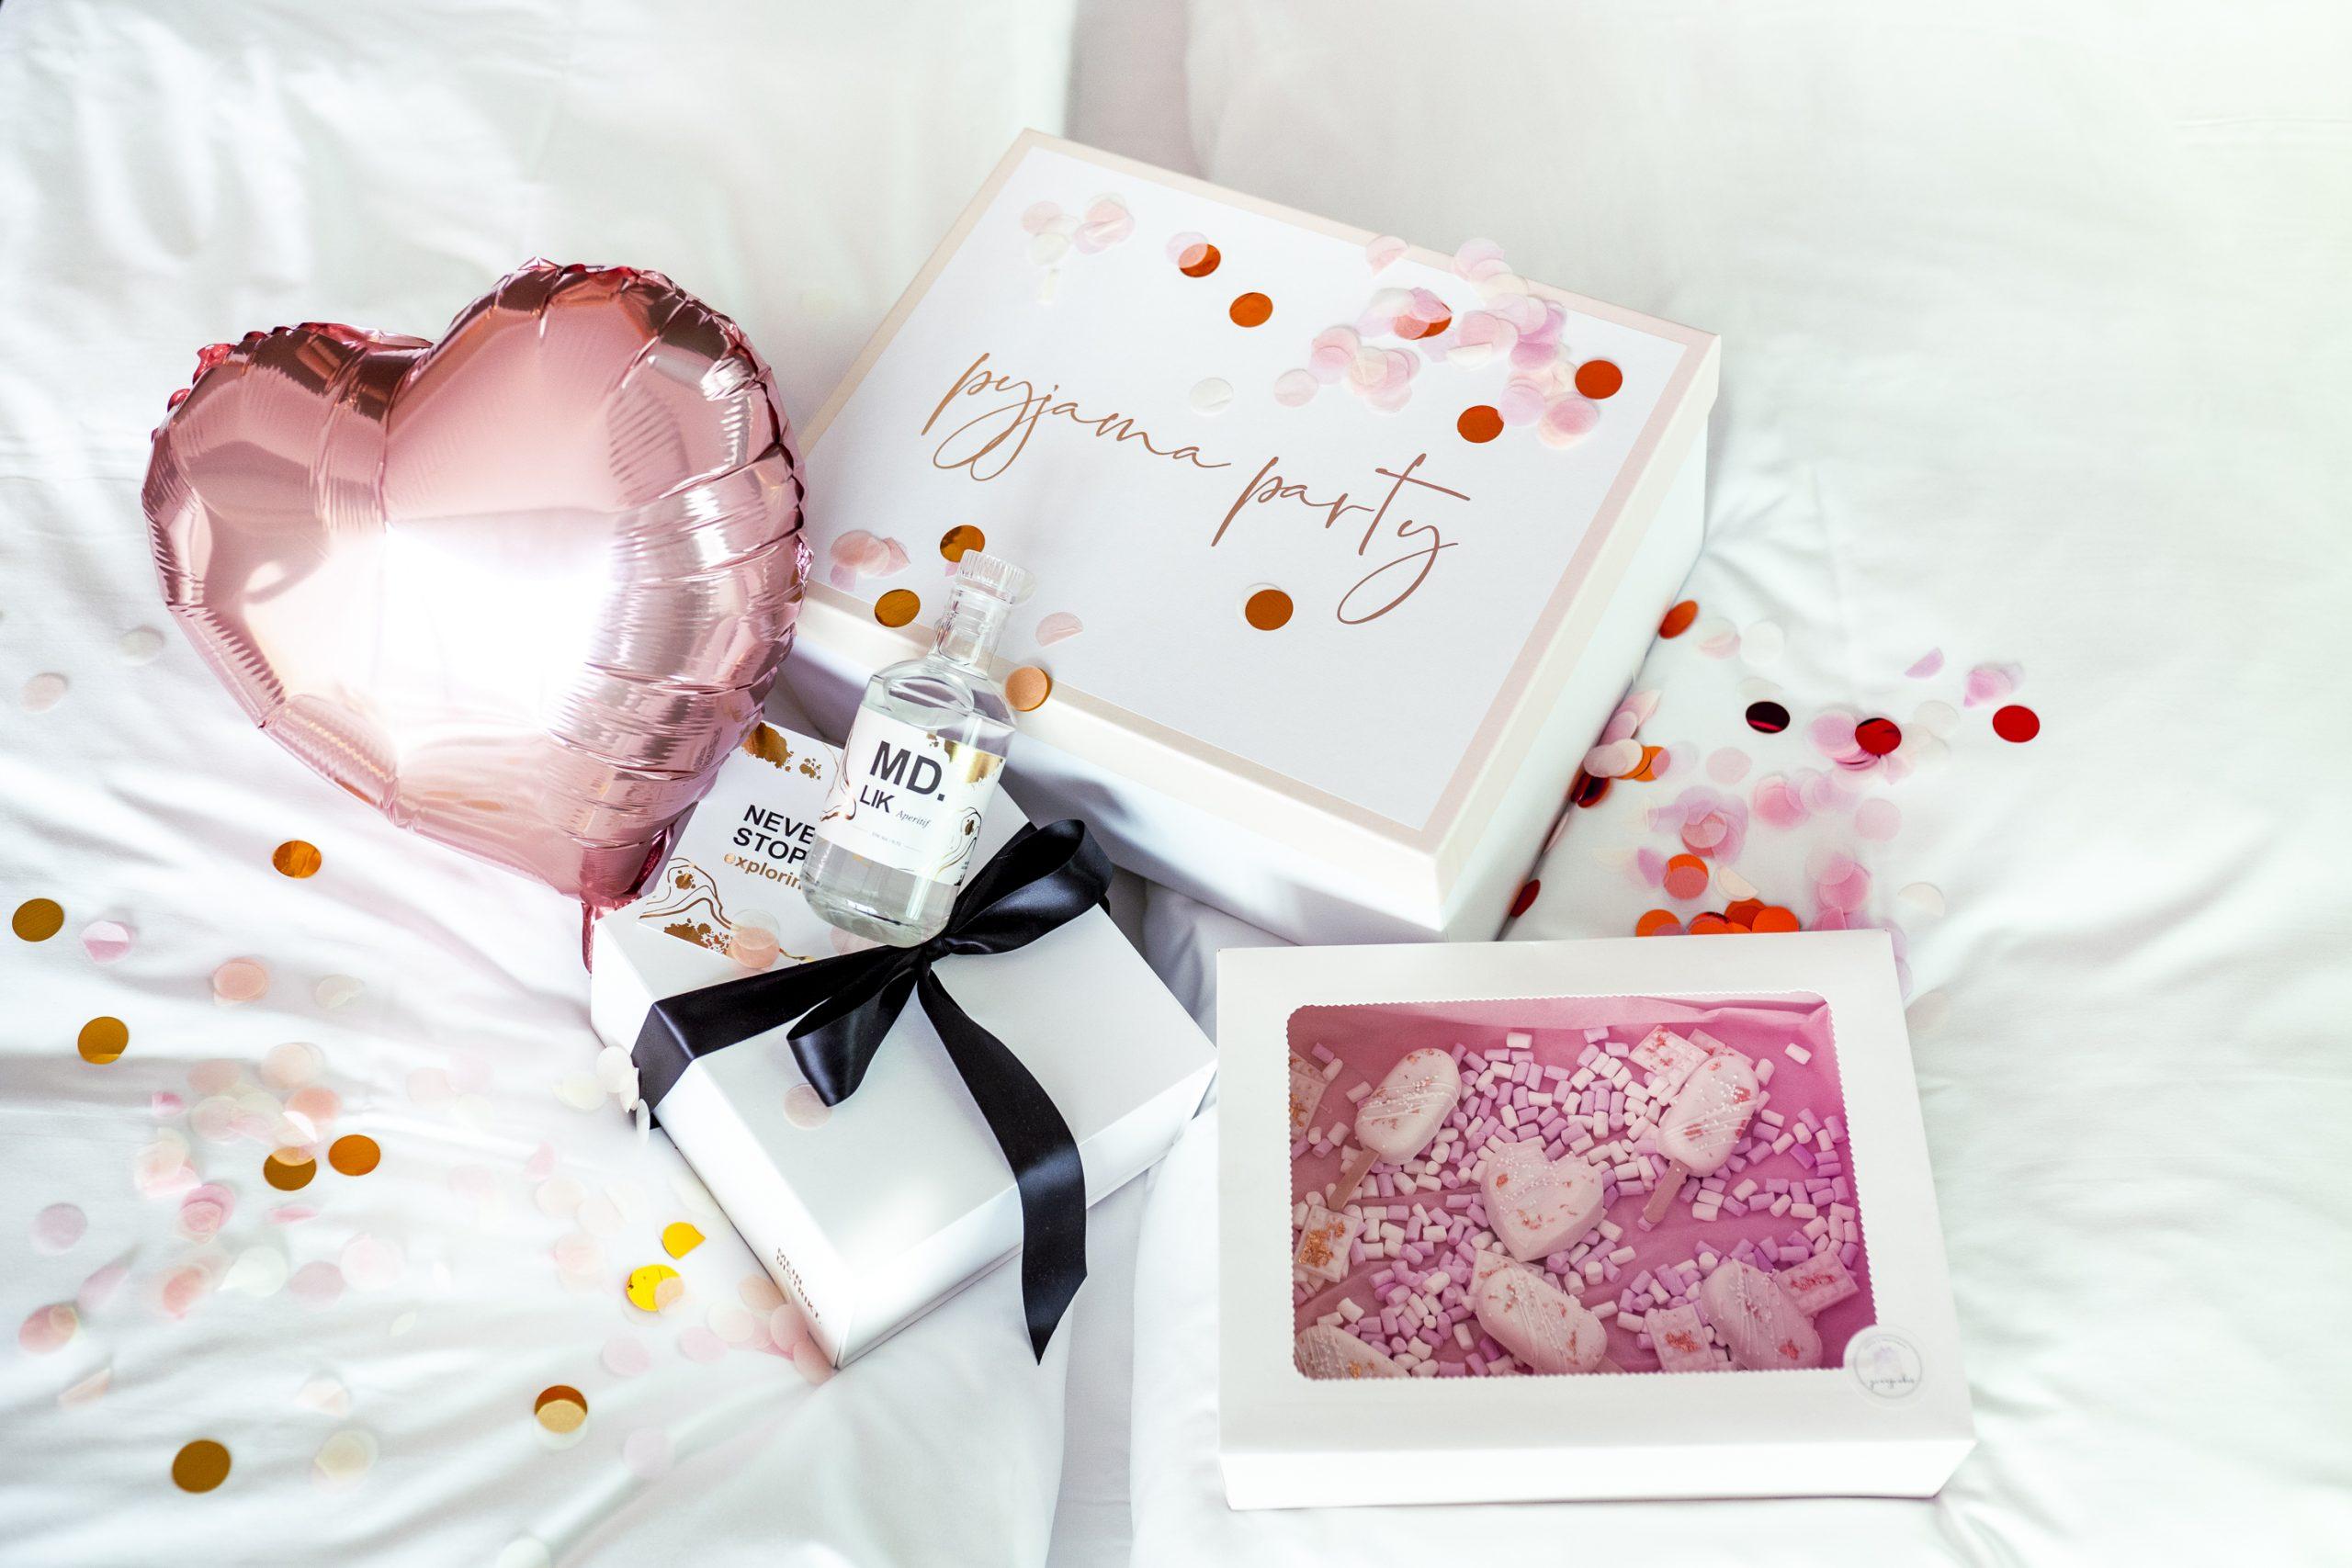 girlsuNIGHTed Box